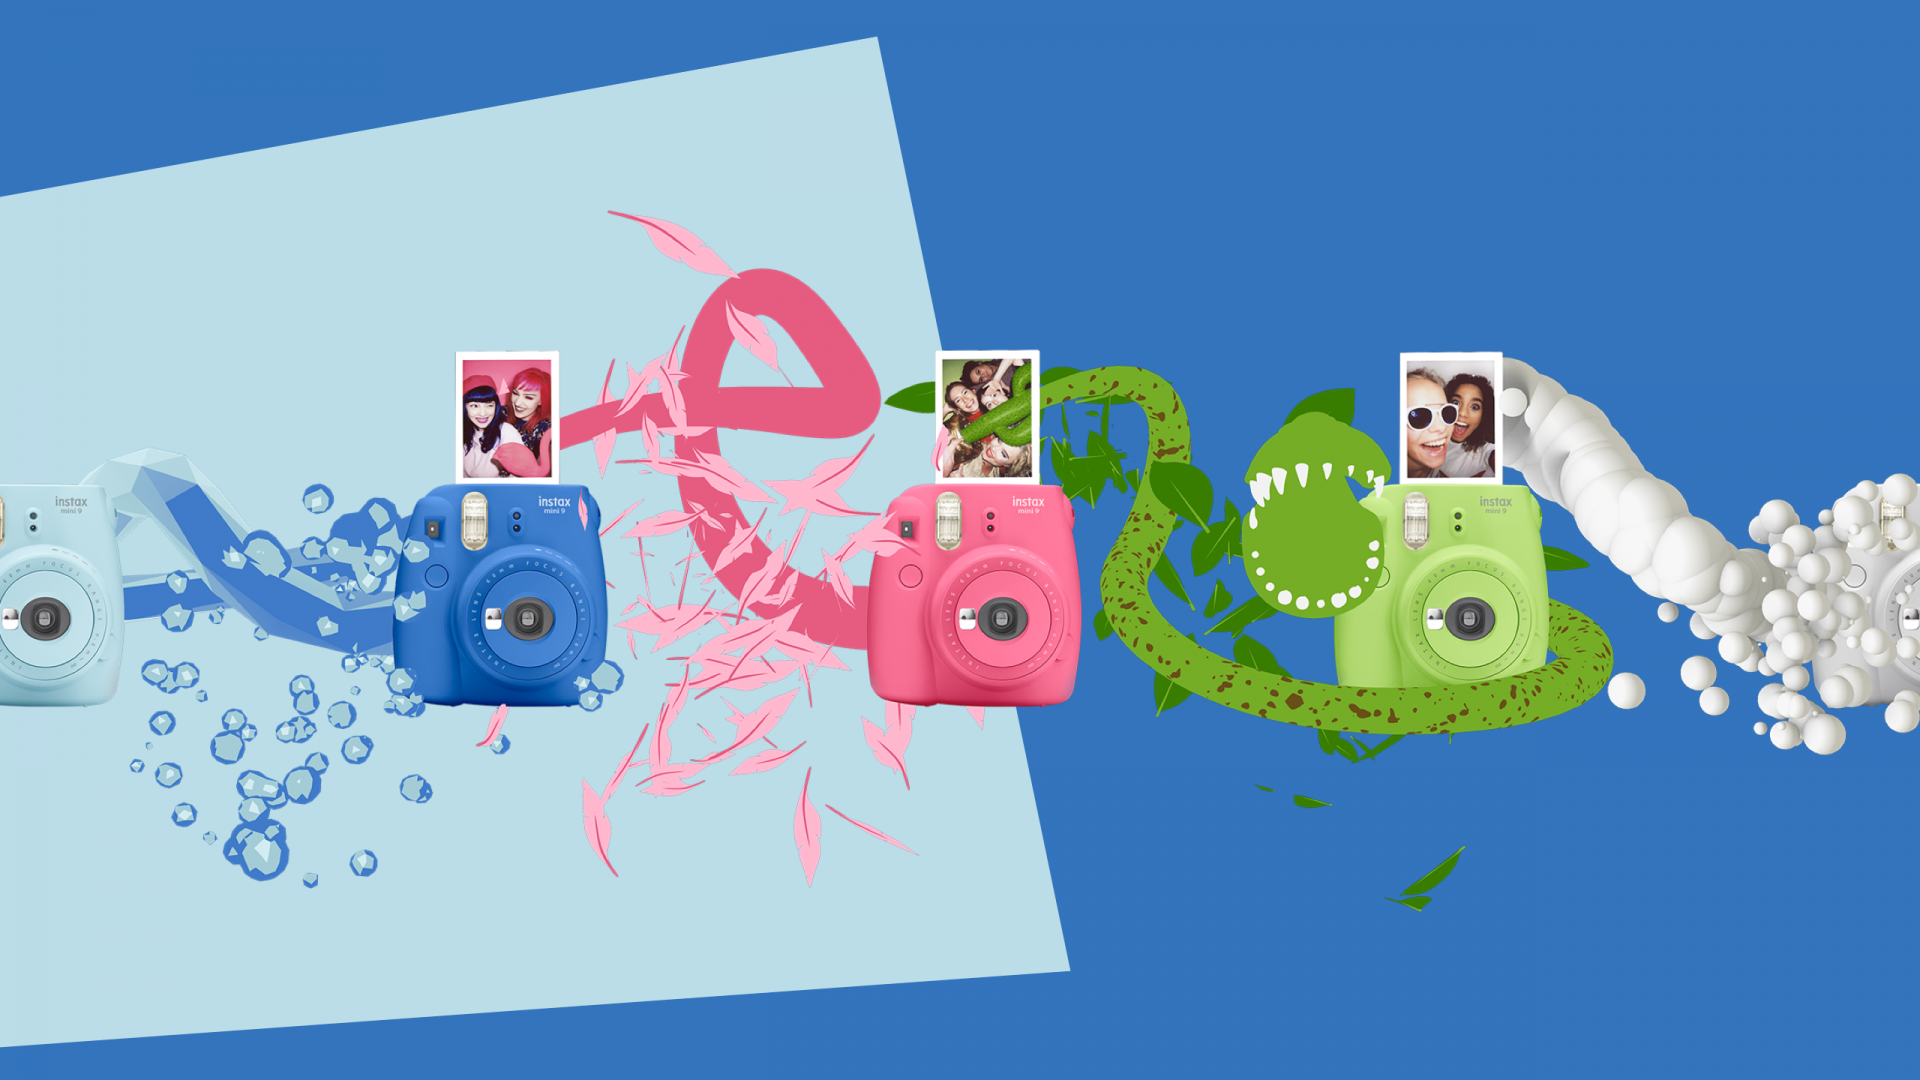 Fullscreen image